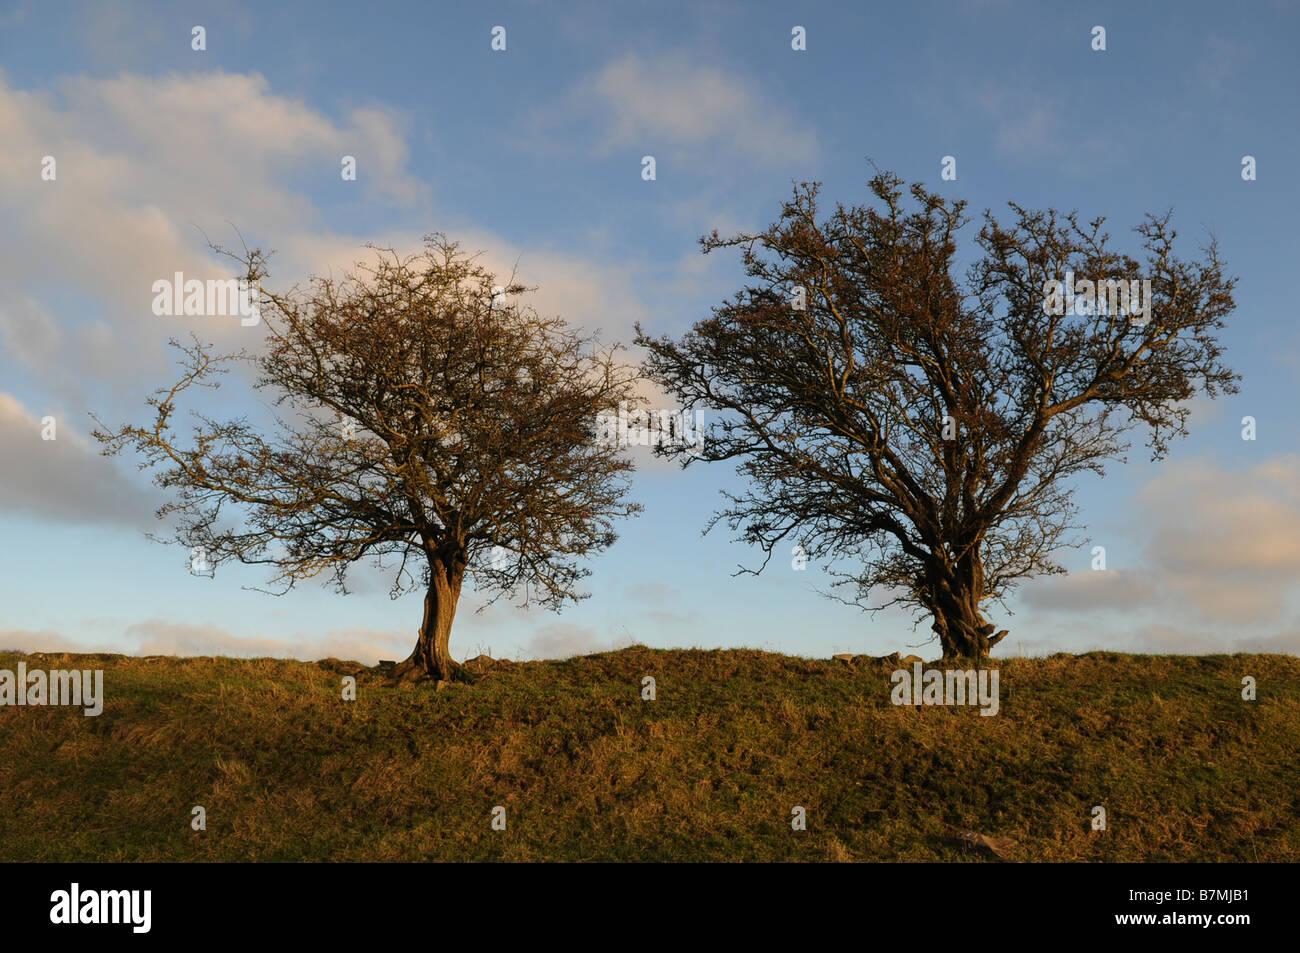 Hawthorn trees on the Hill of Tara, County Meath, Ireland - Stock Image